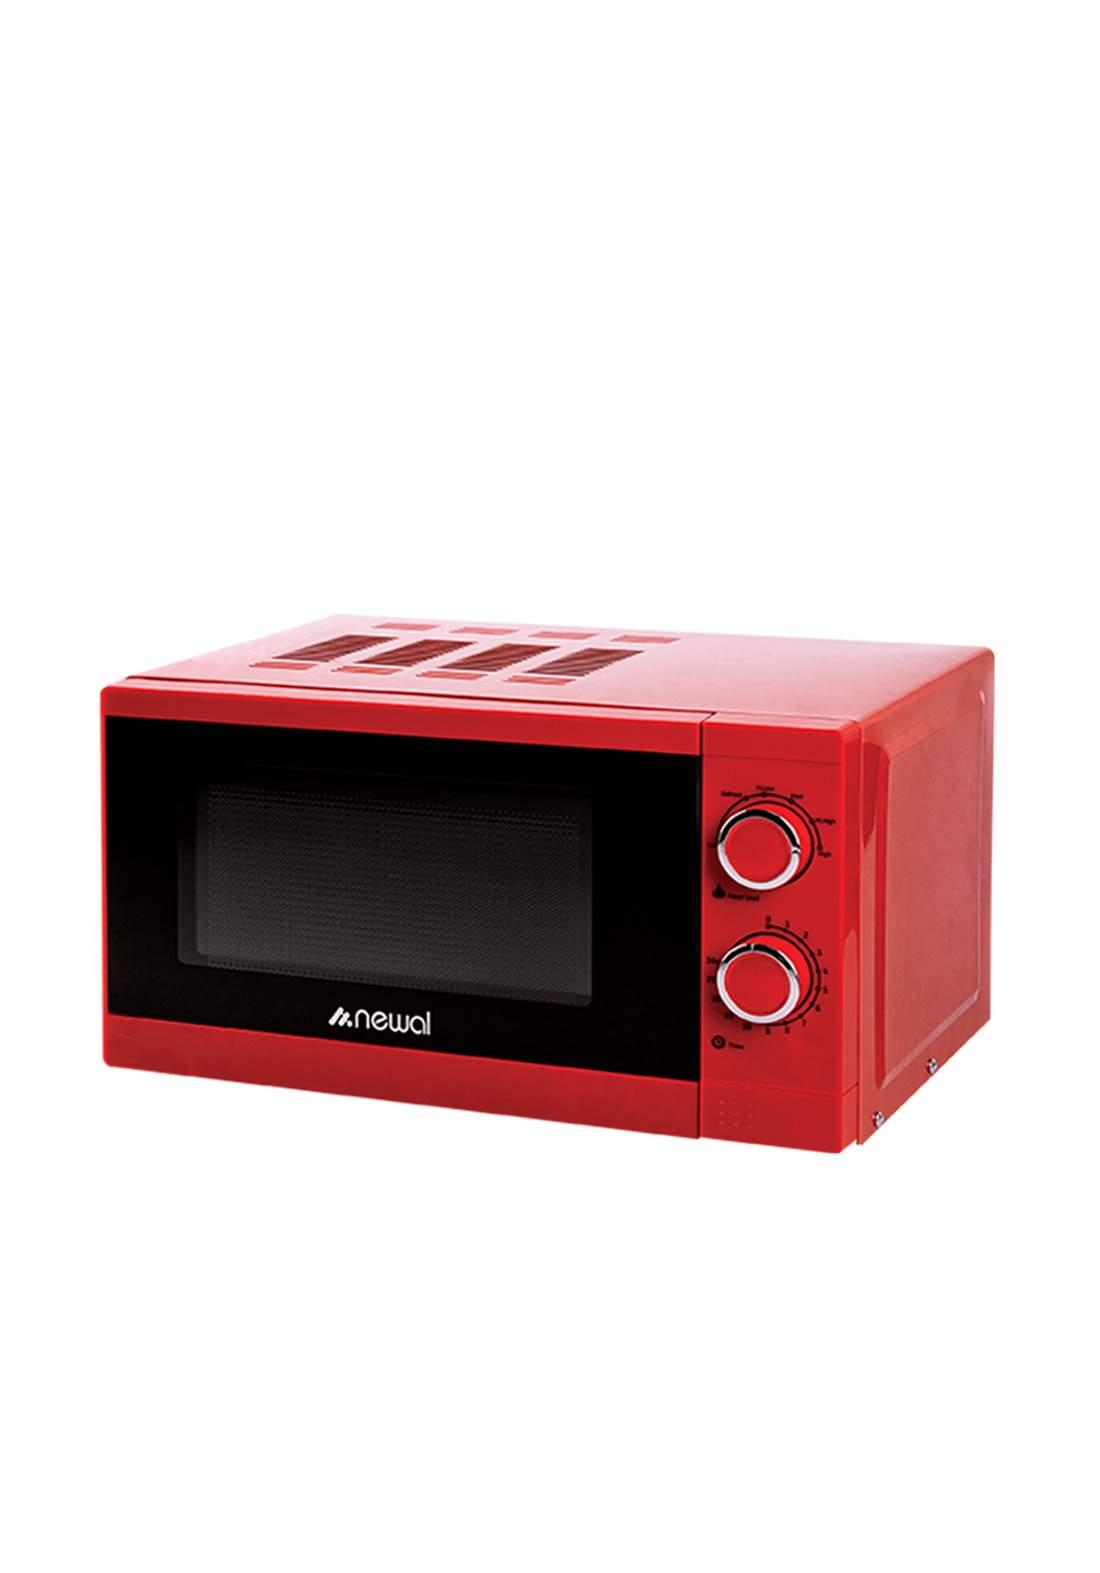 Newal MWO-261-03 Microvawe Oven 20 L فرن مايكرويف